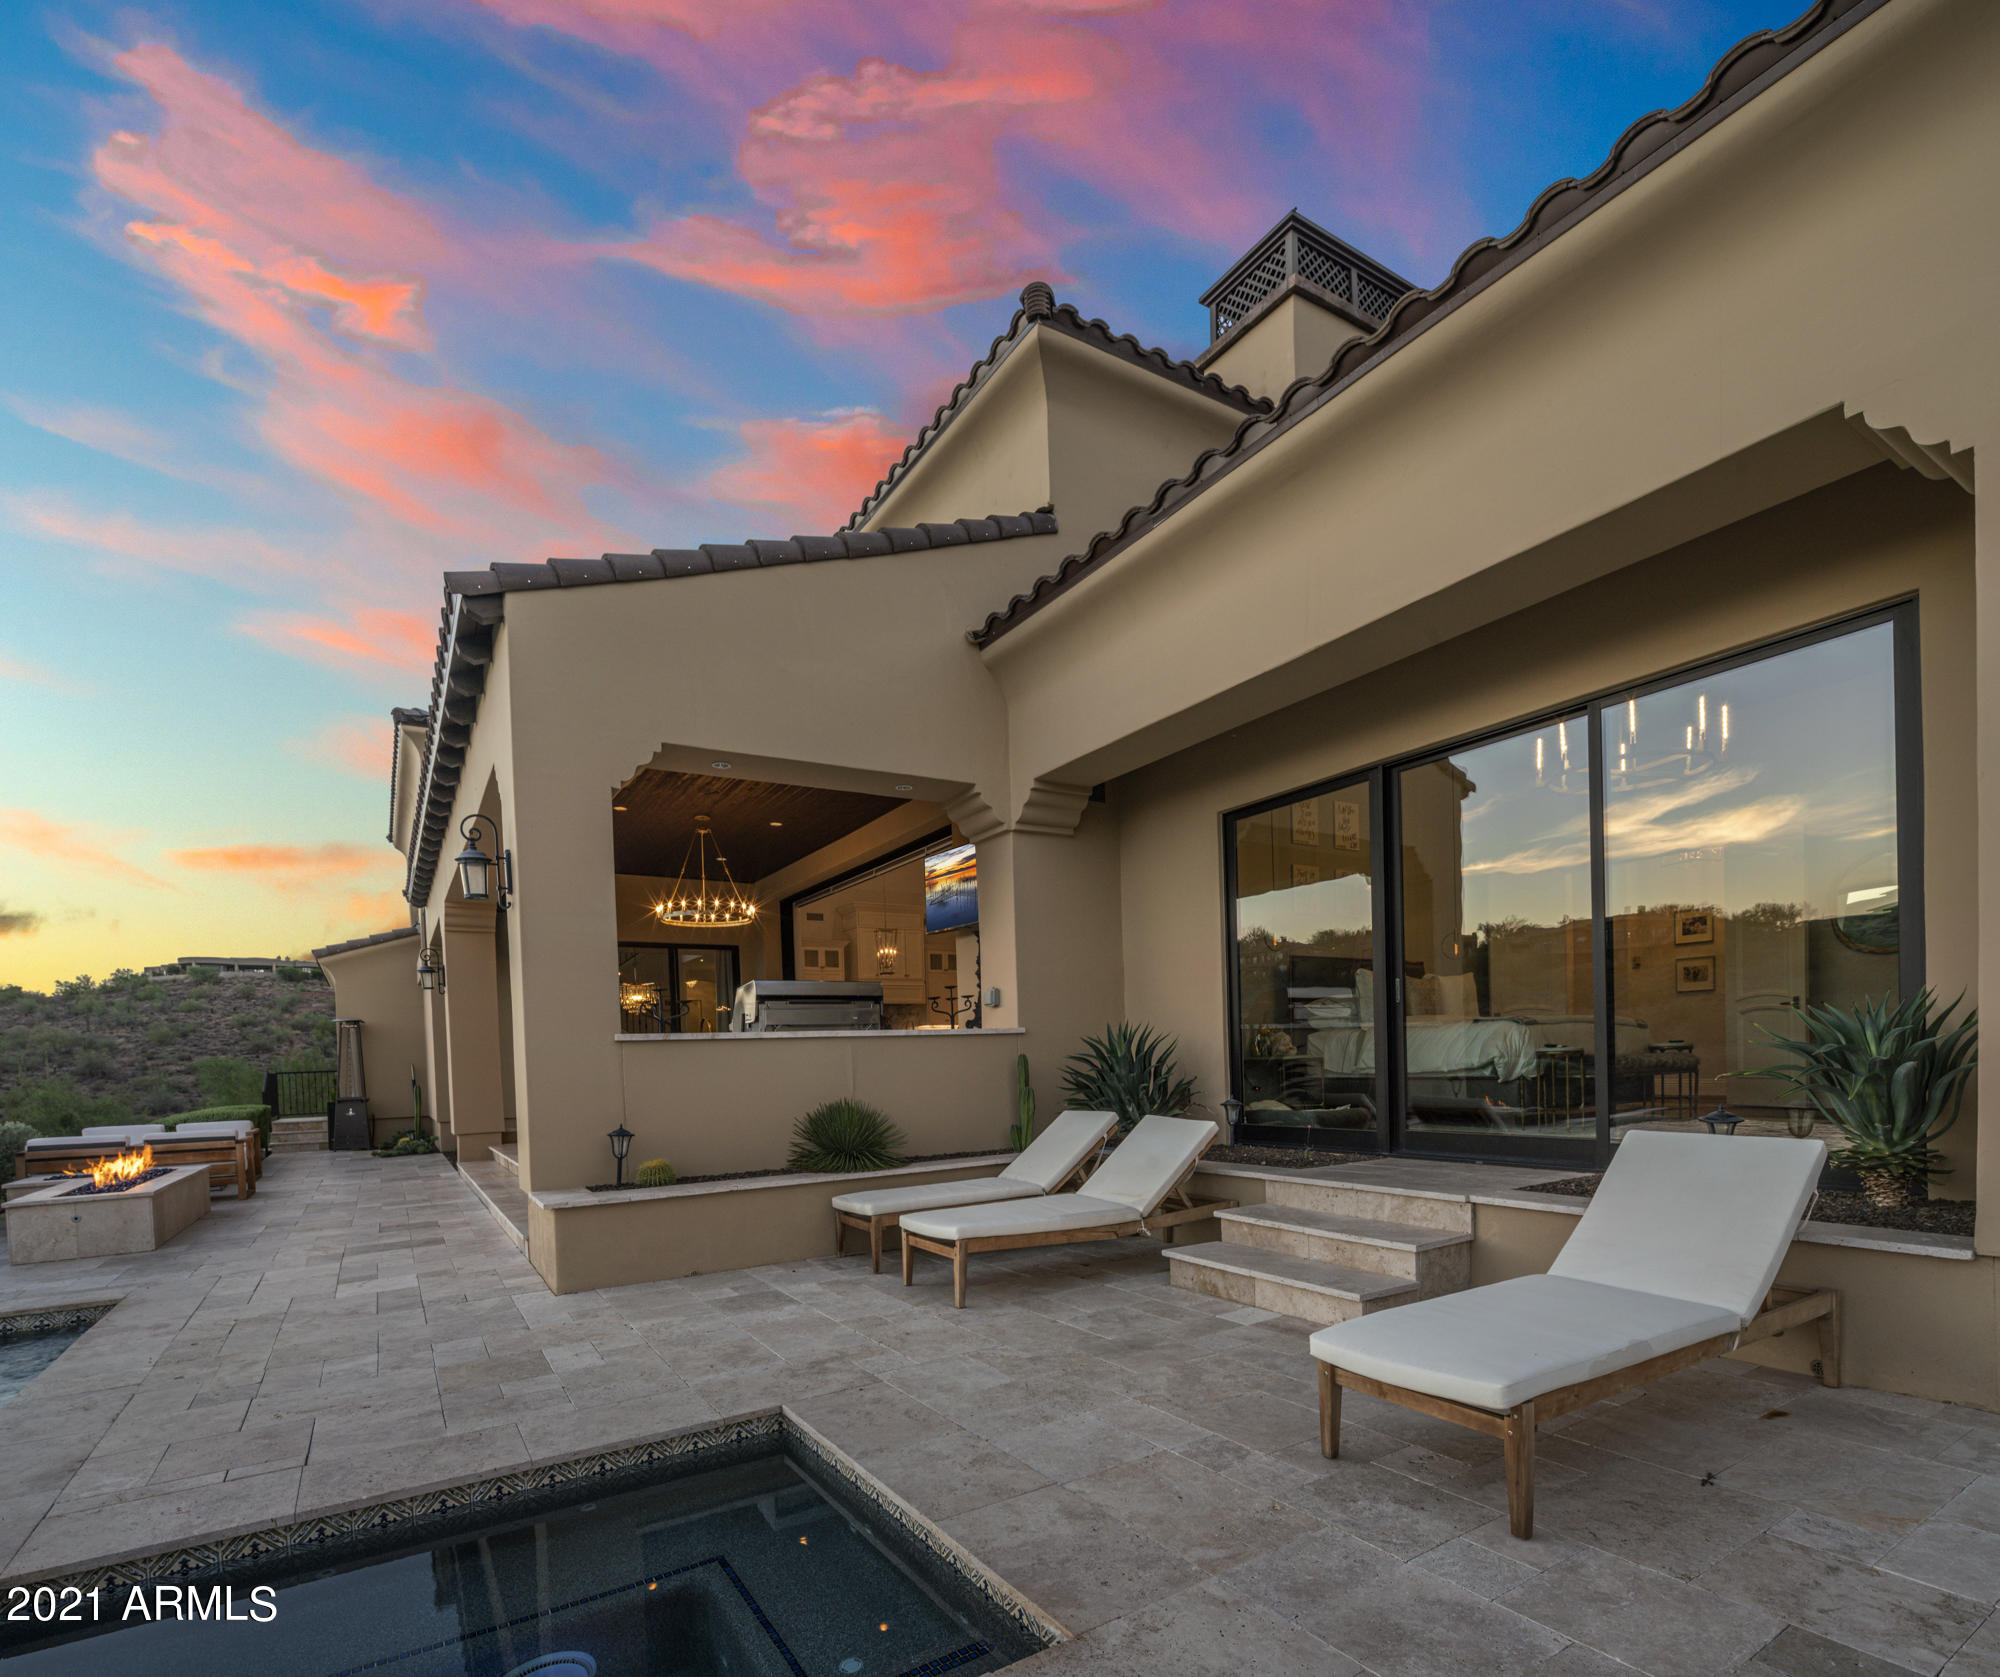 MLS 6272031 9744 N FIRERIDGE Trail, Fountain Hills, AZ 85268 Fountain Hills AZ Mountain View